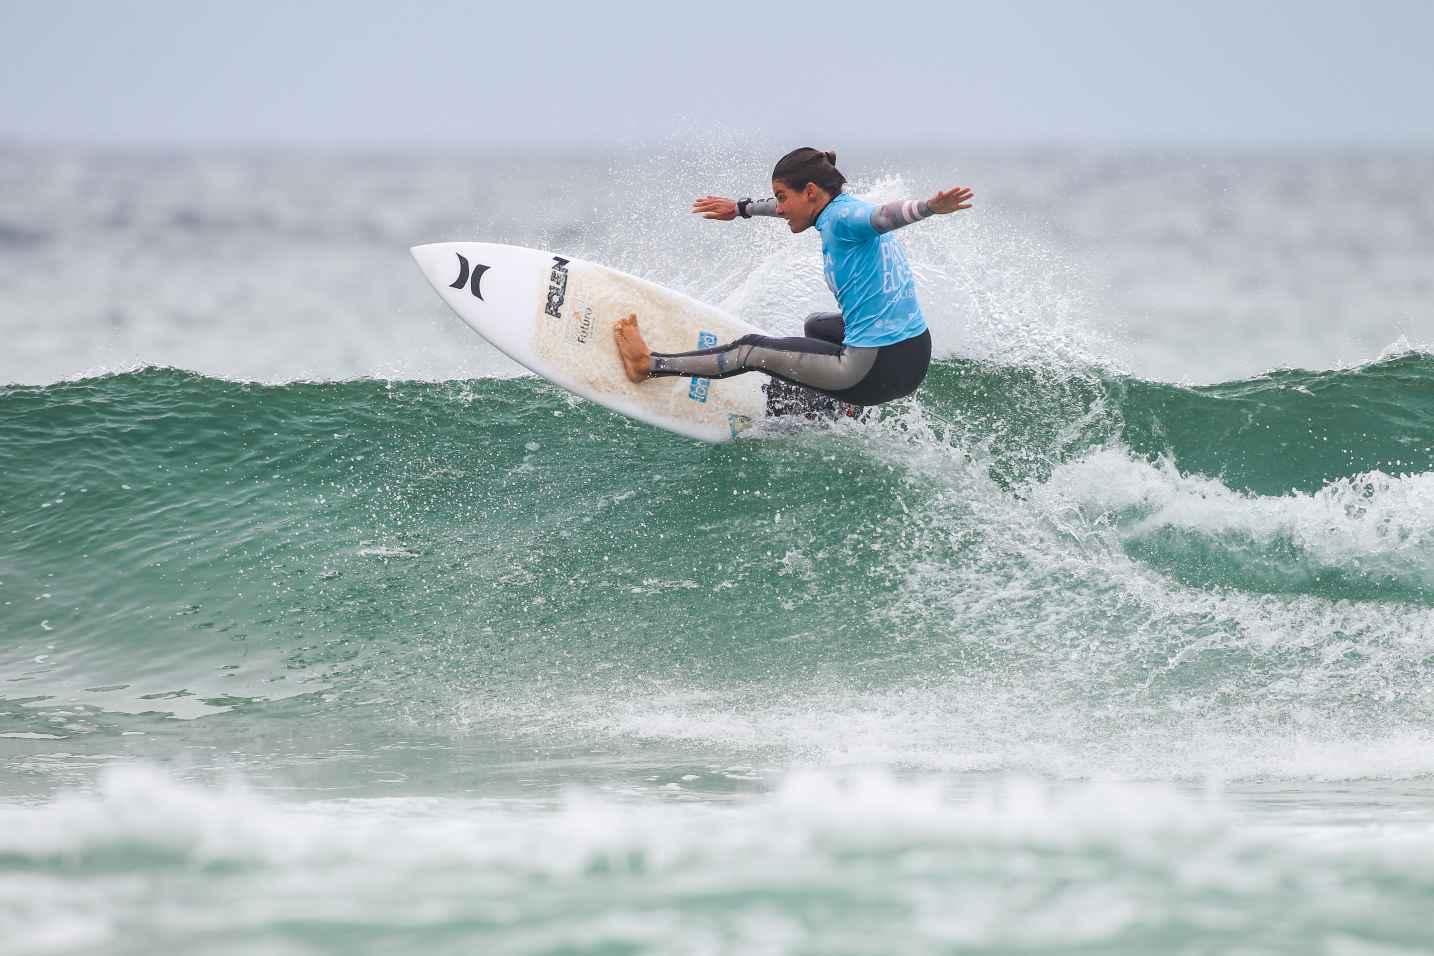 surf30 pantin classic 2021 wsl surf Carolina Mendes 9562PantinClassic2021Masurel